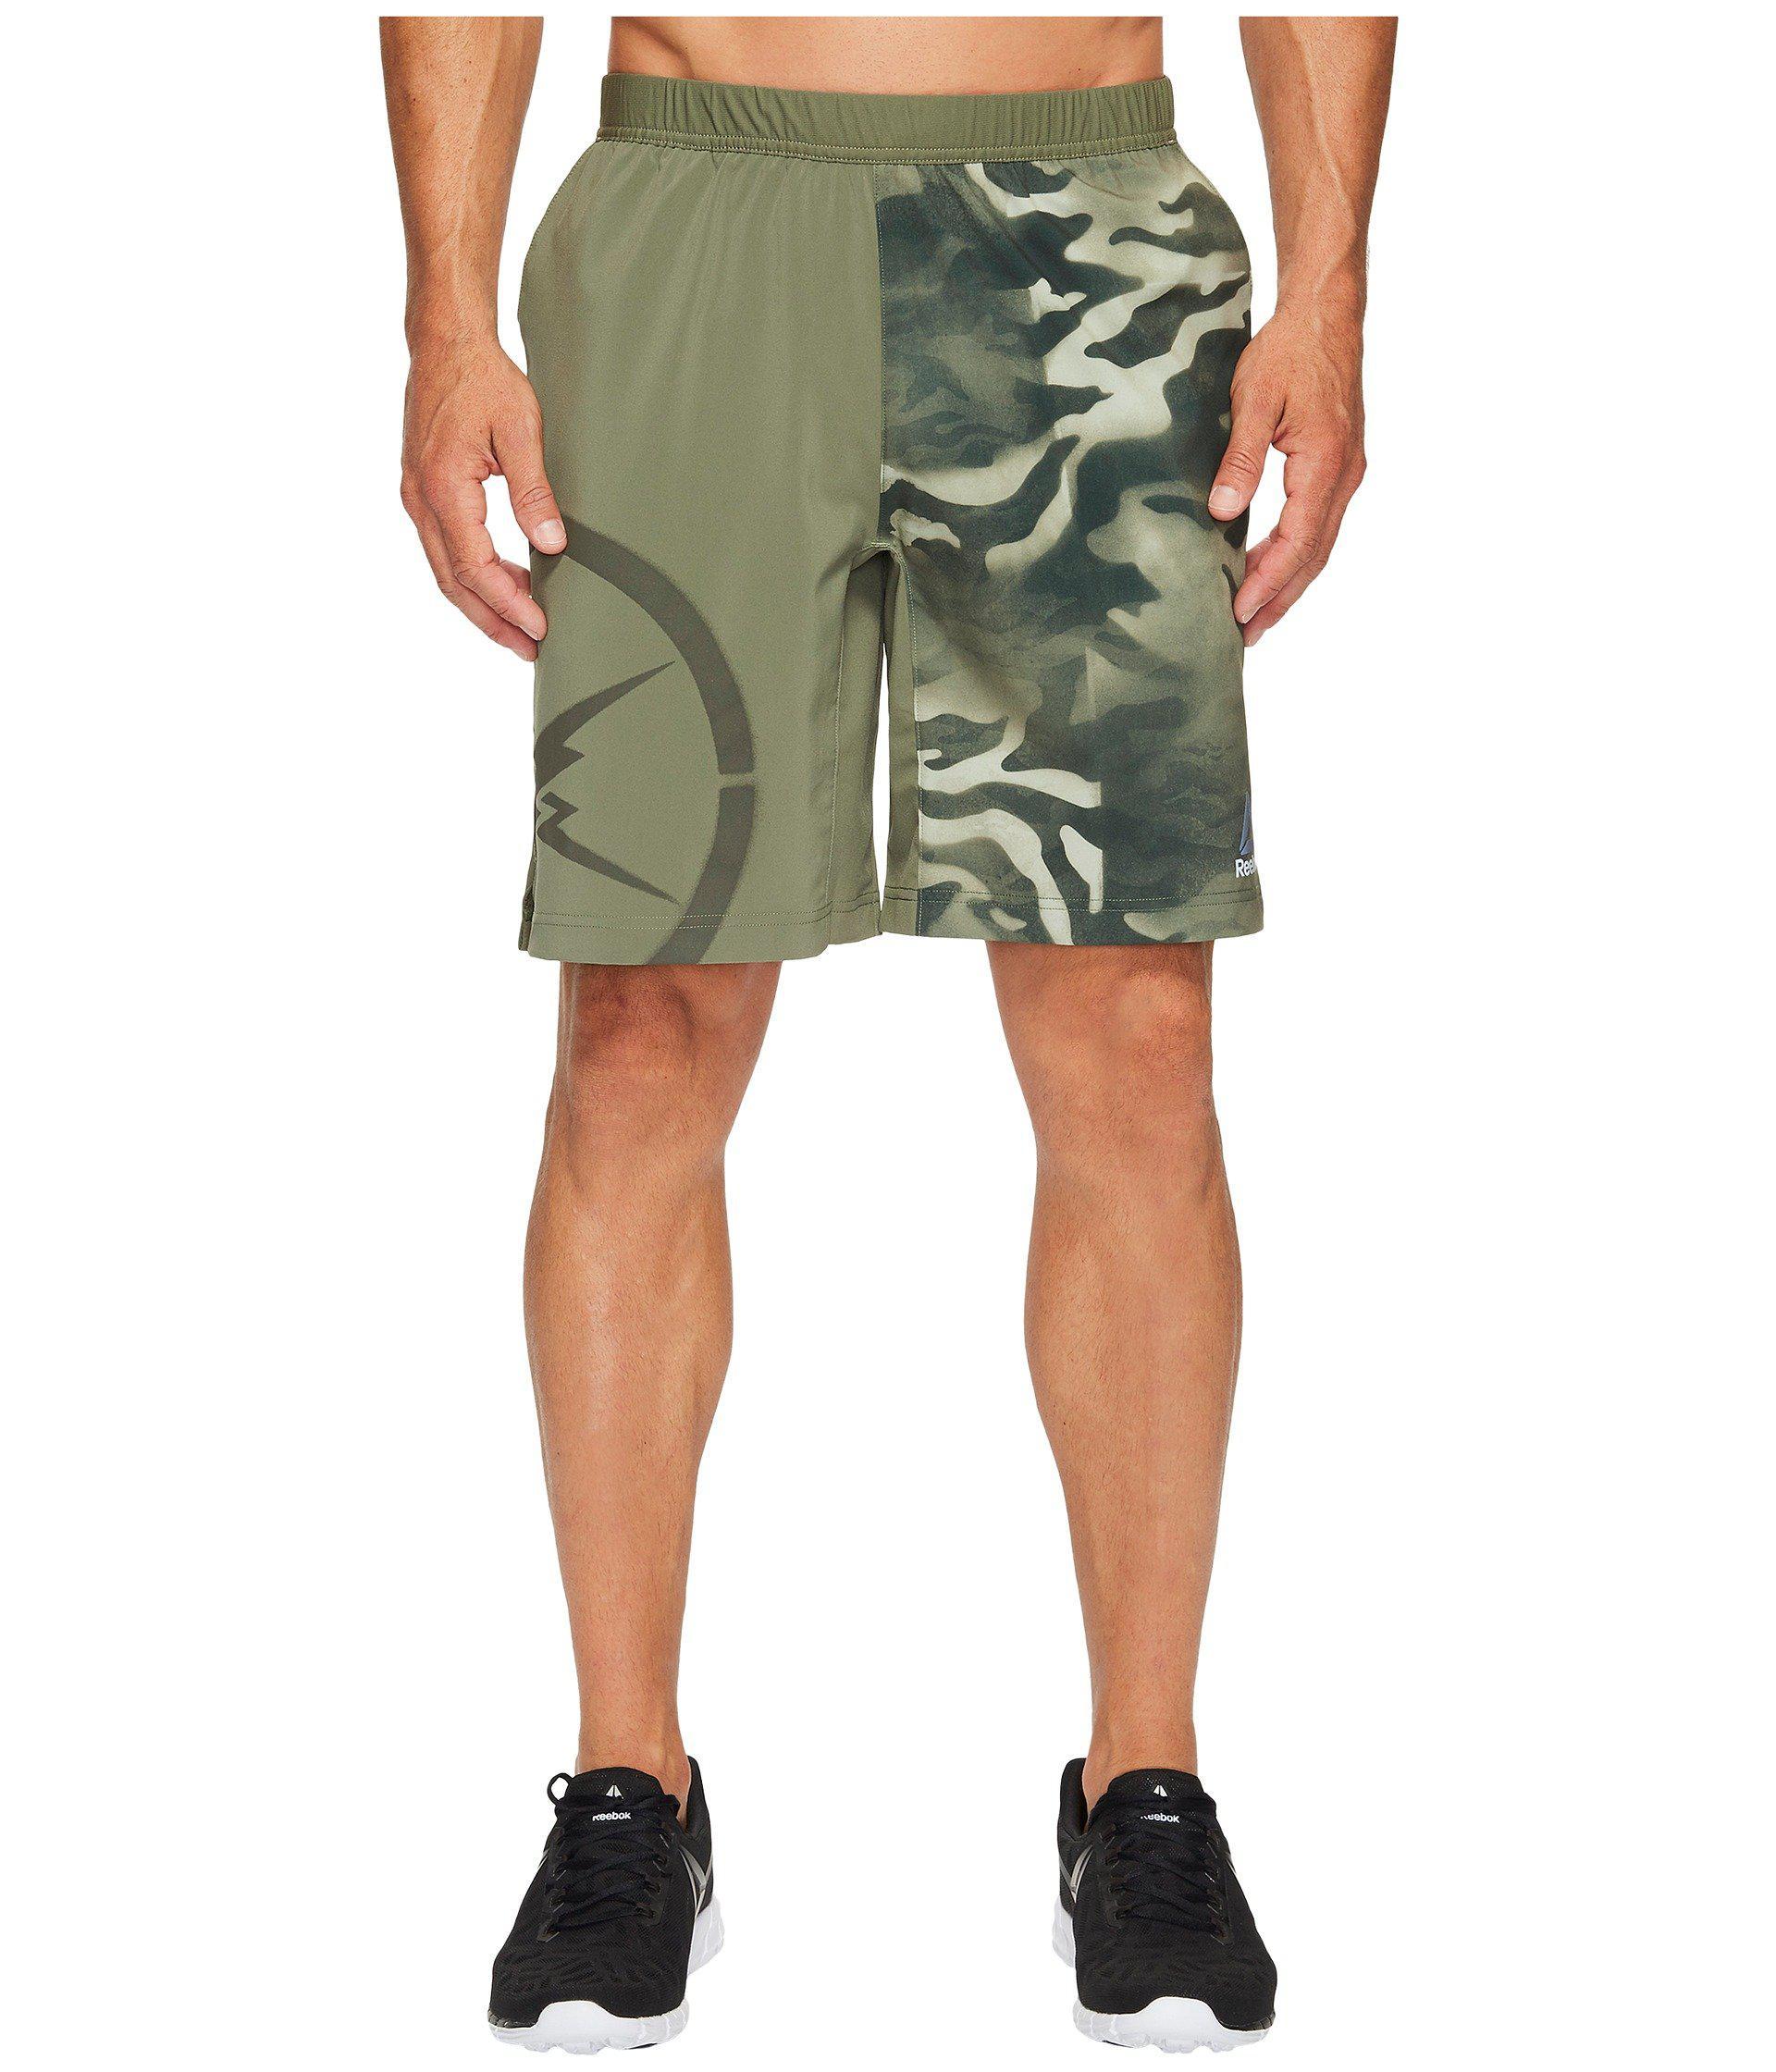 21e077849859 Lyst - Reebok Camo Speed Shorts in Green for Men